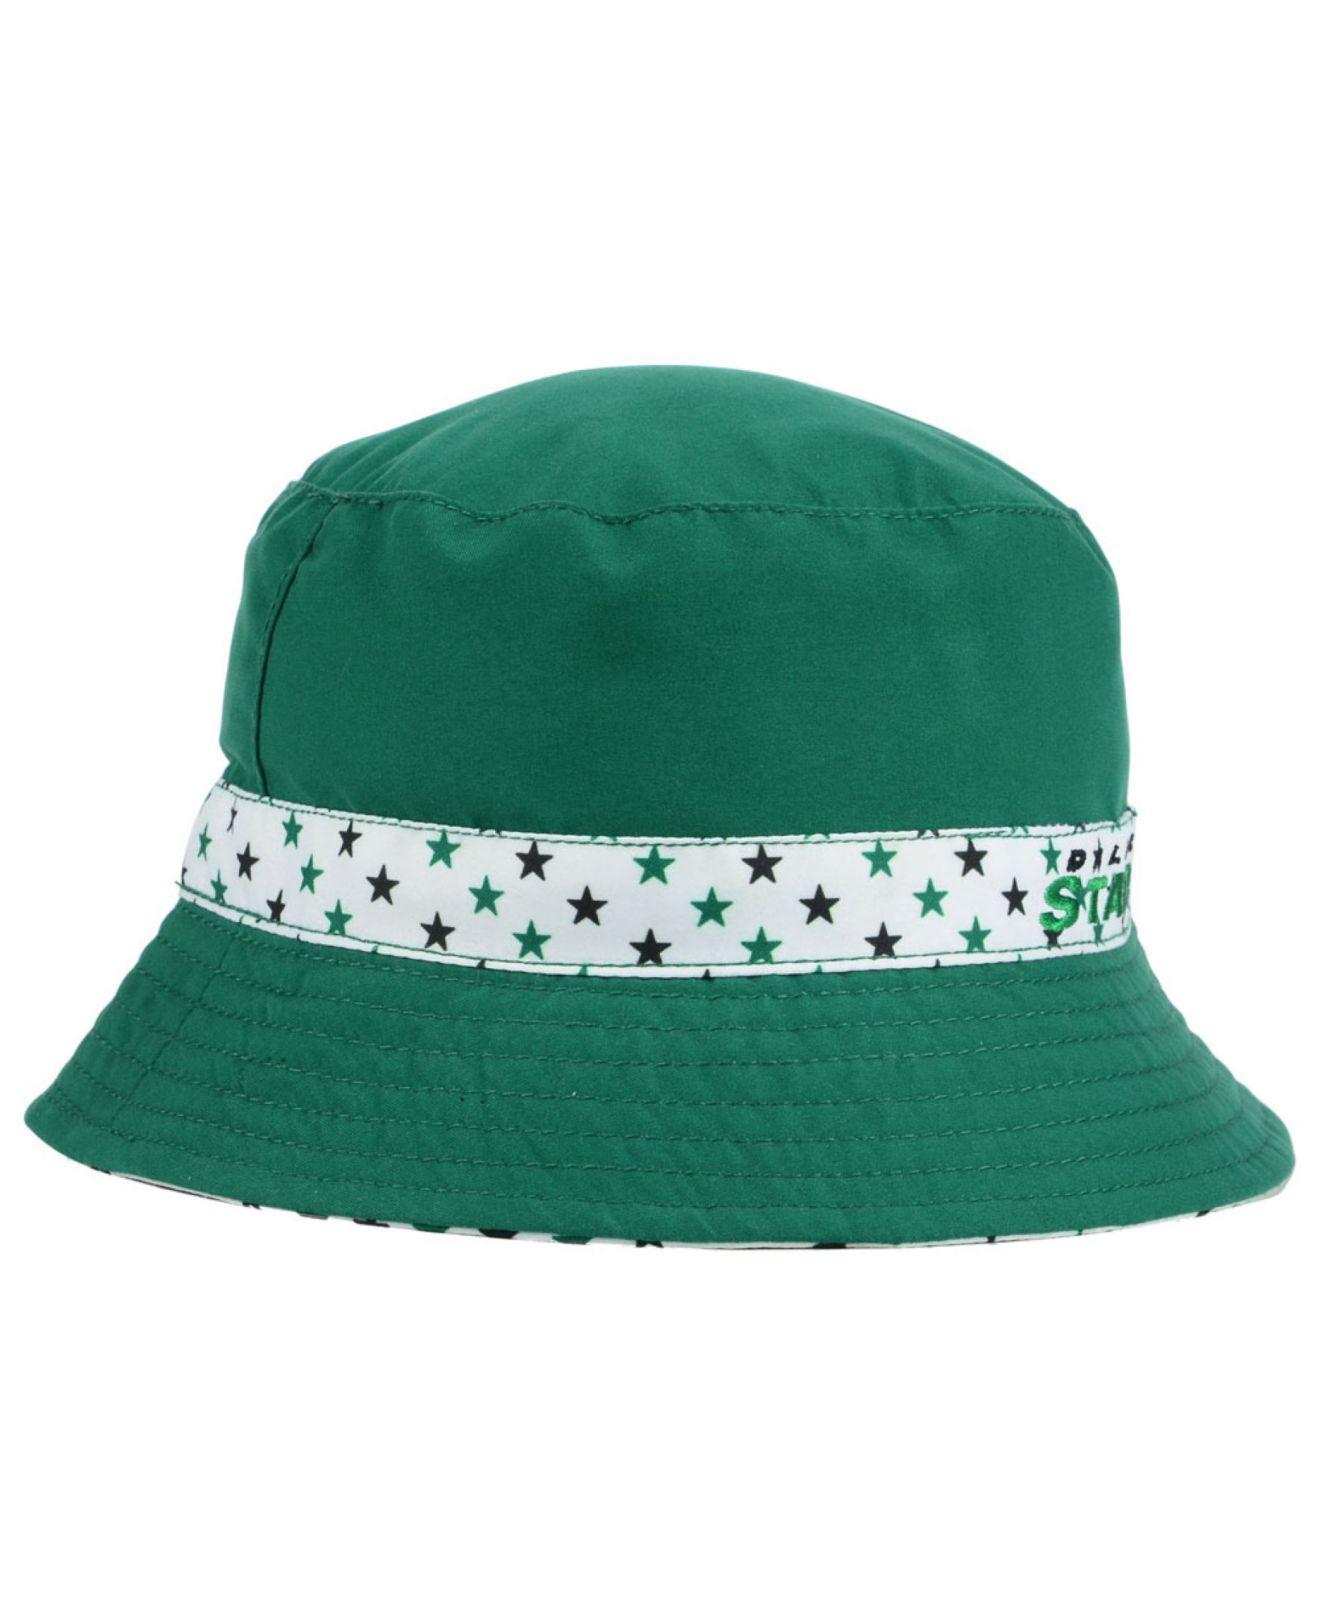 buy online 3ee66 2c3a3 ... get lyst ktz kids dallas stars reversible bucket hat in green fc396  9ad66